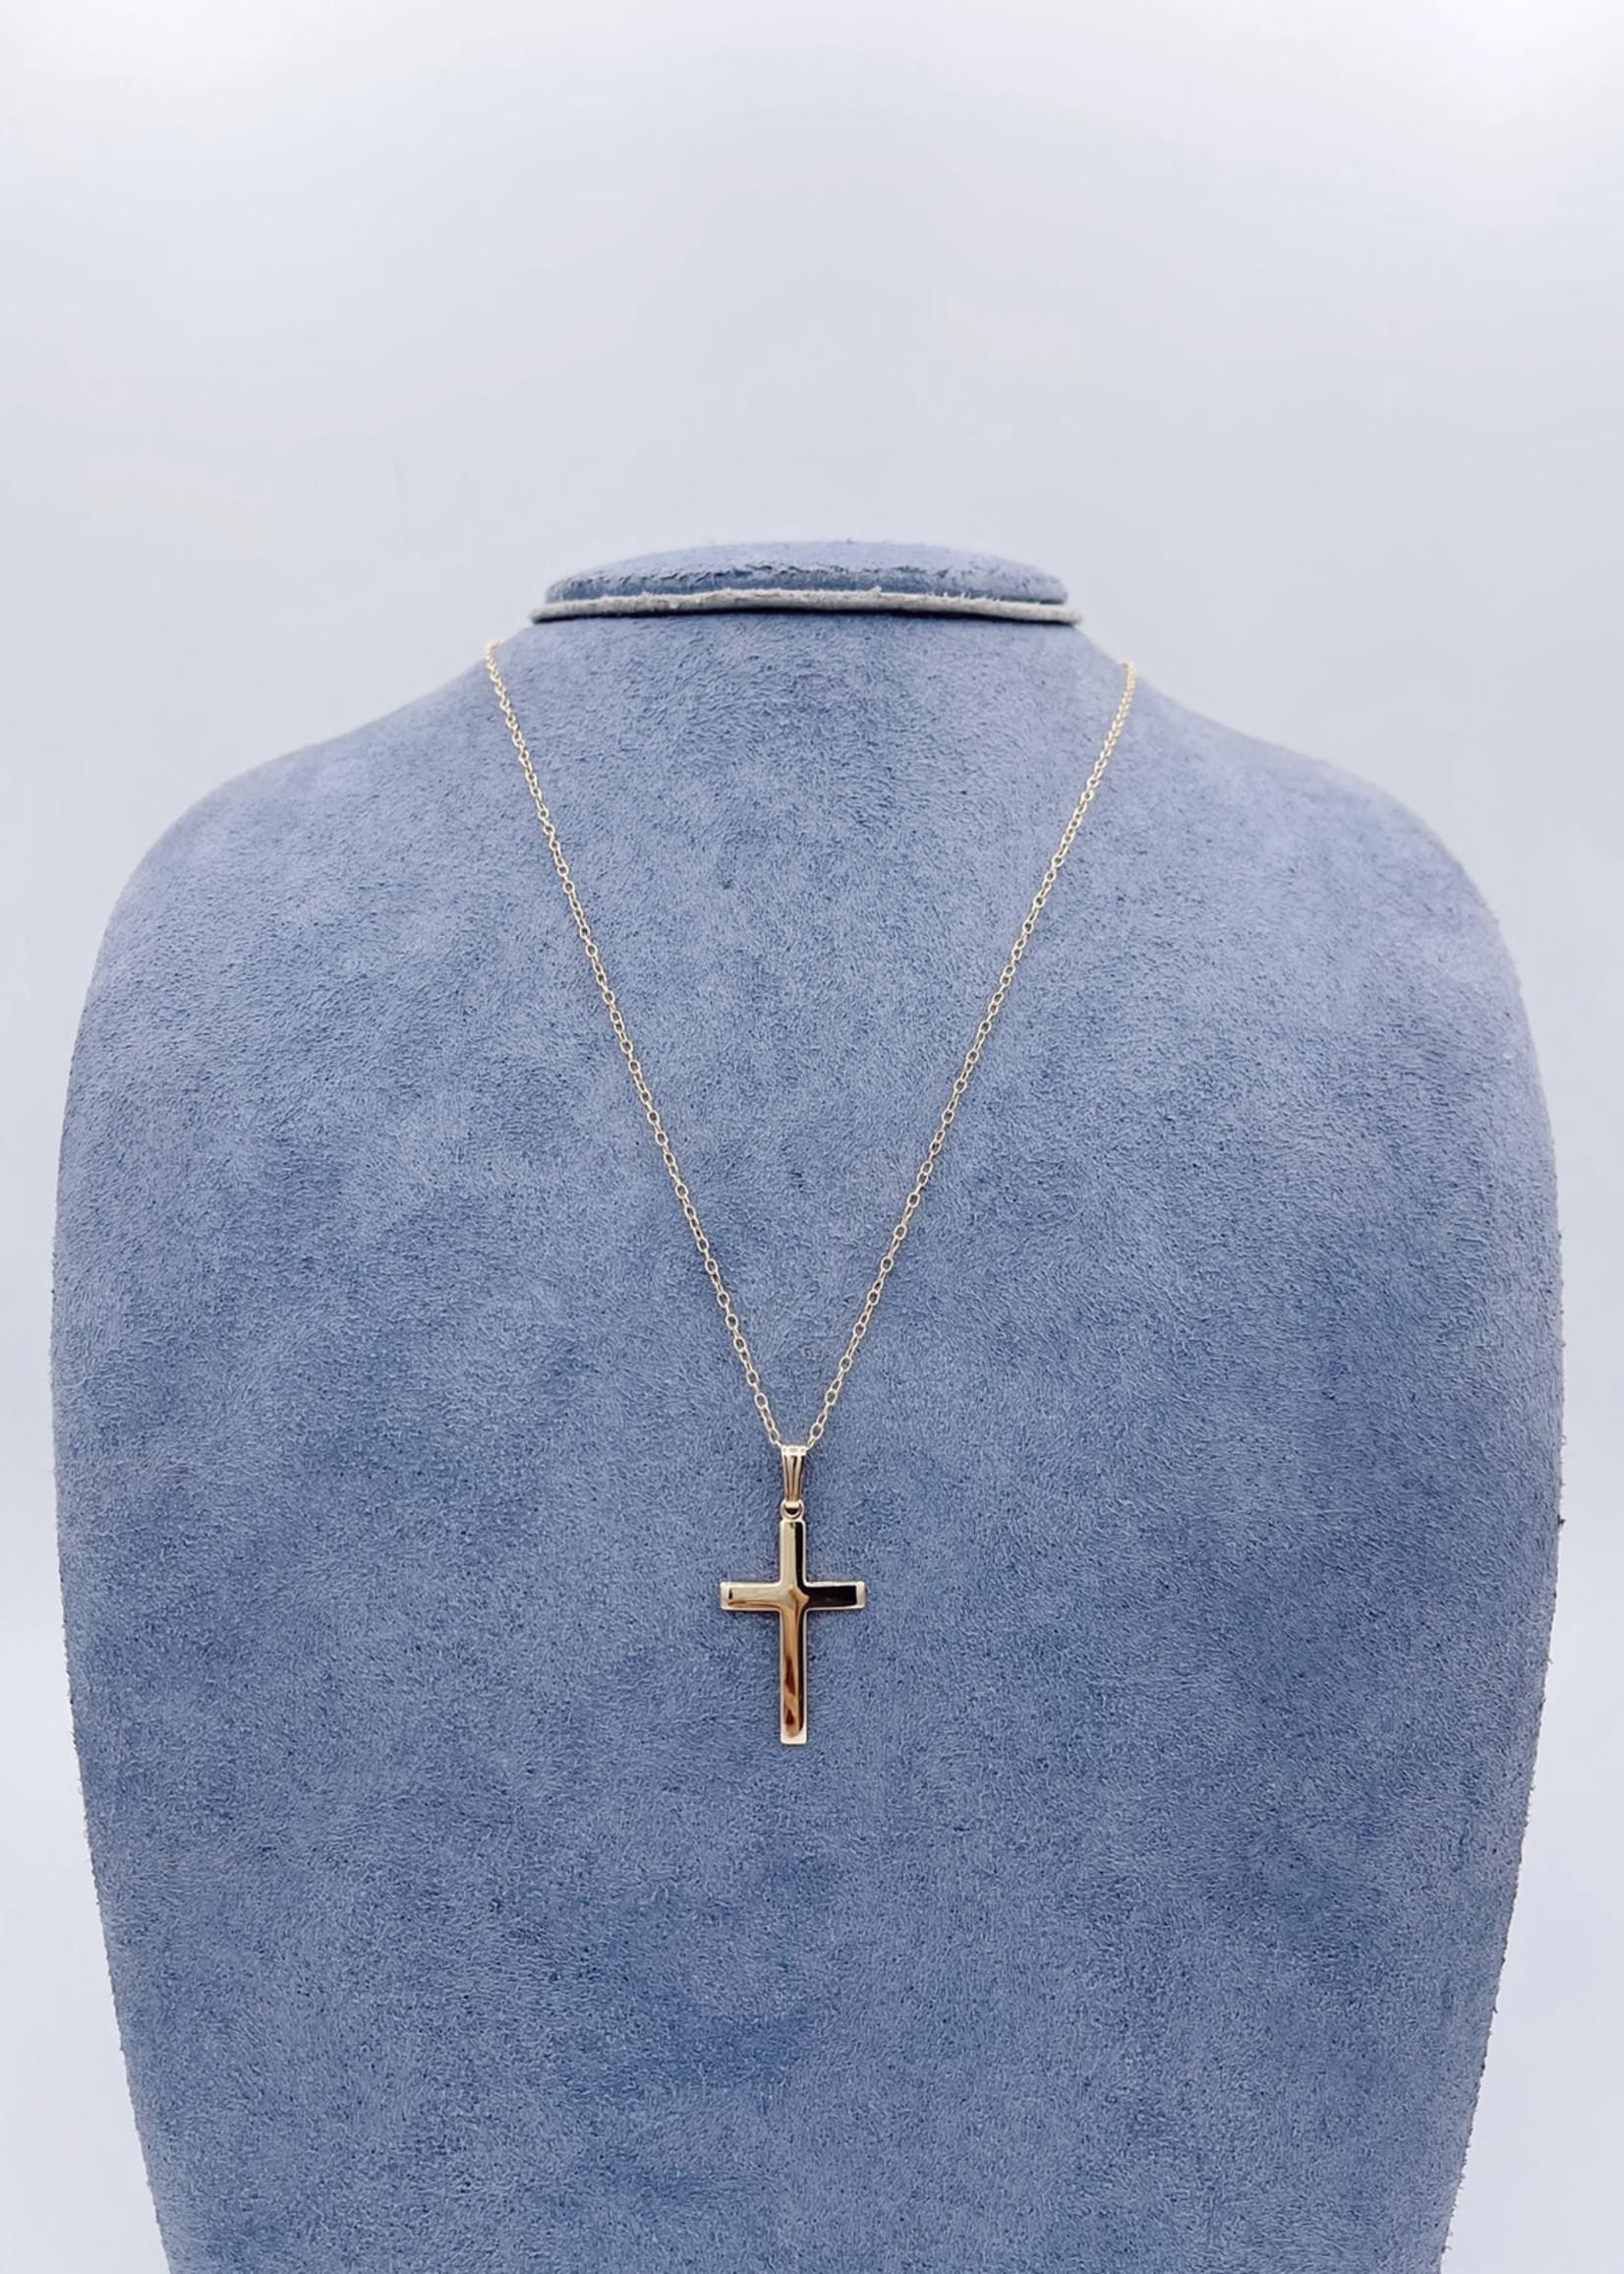 CJ Designs 10kY Gold Cross Necklace